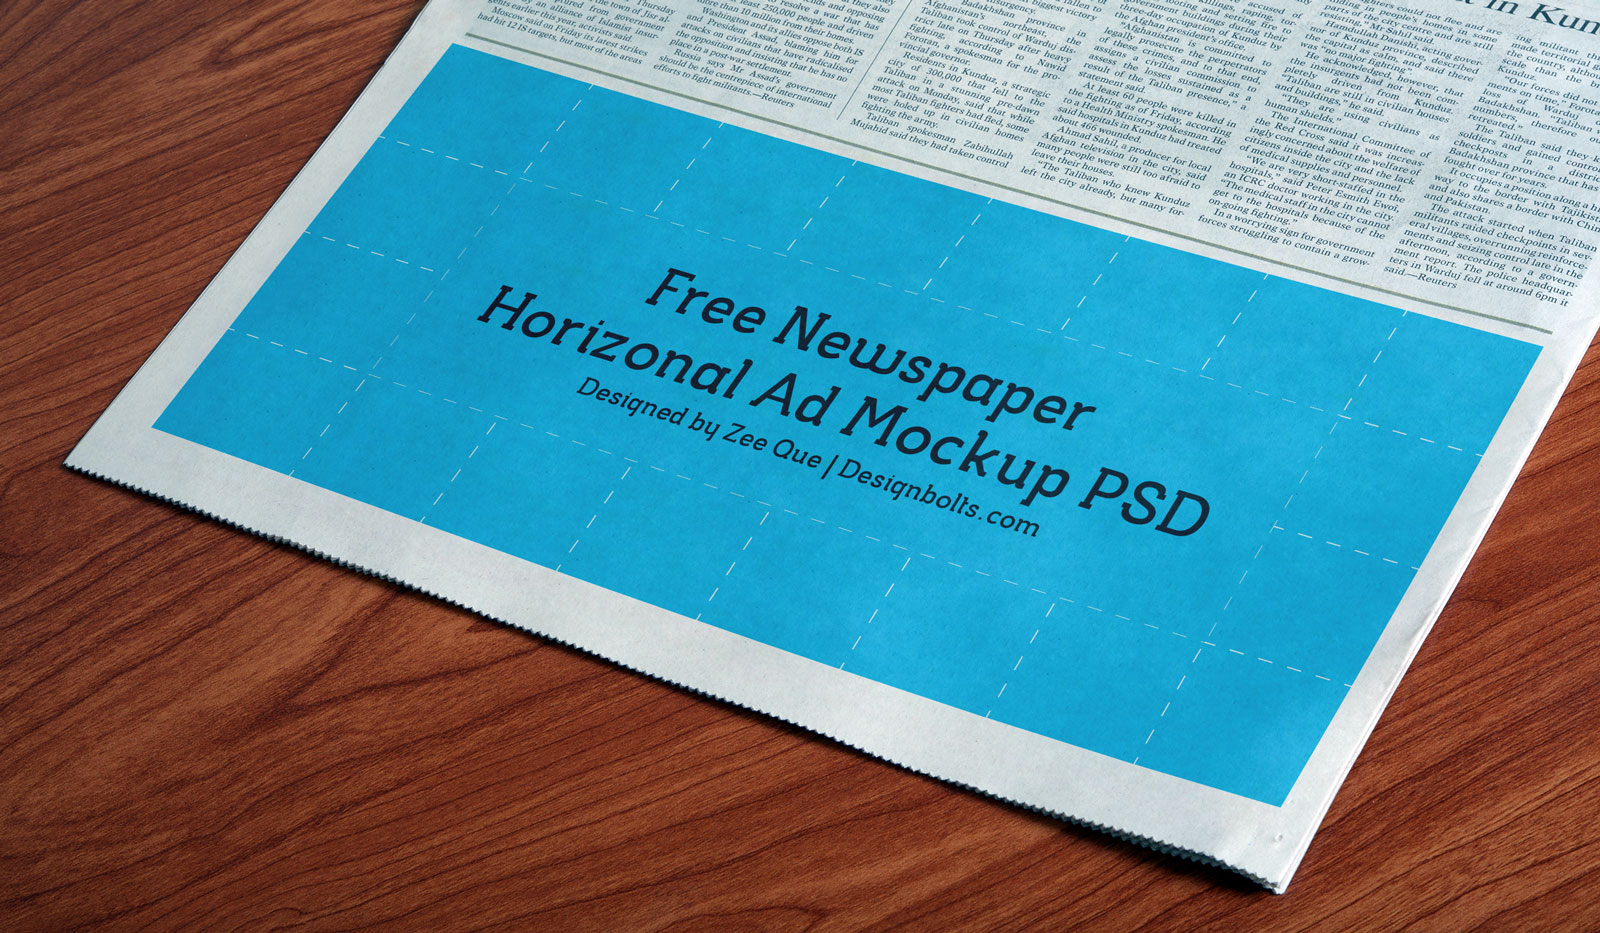 Free-Newspaper-Horizonal-Print-Ad-Mockup-PSD